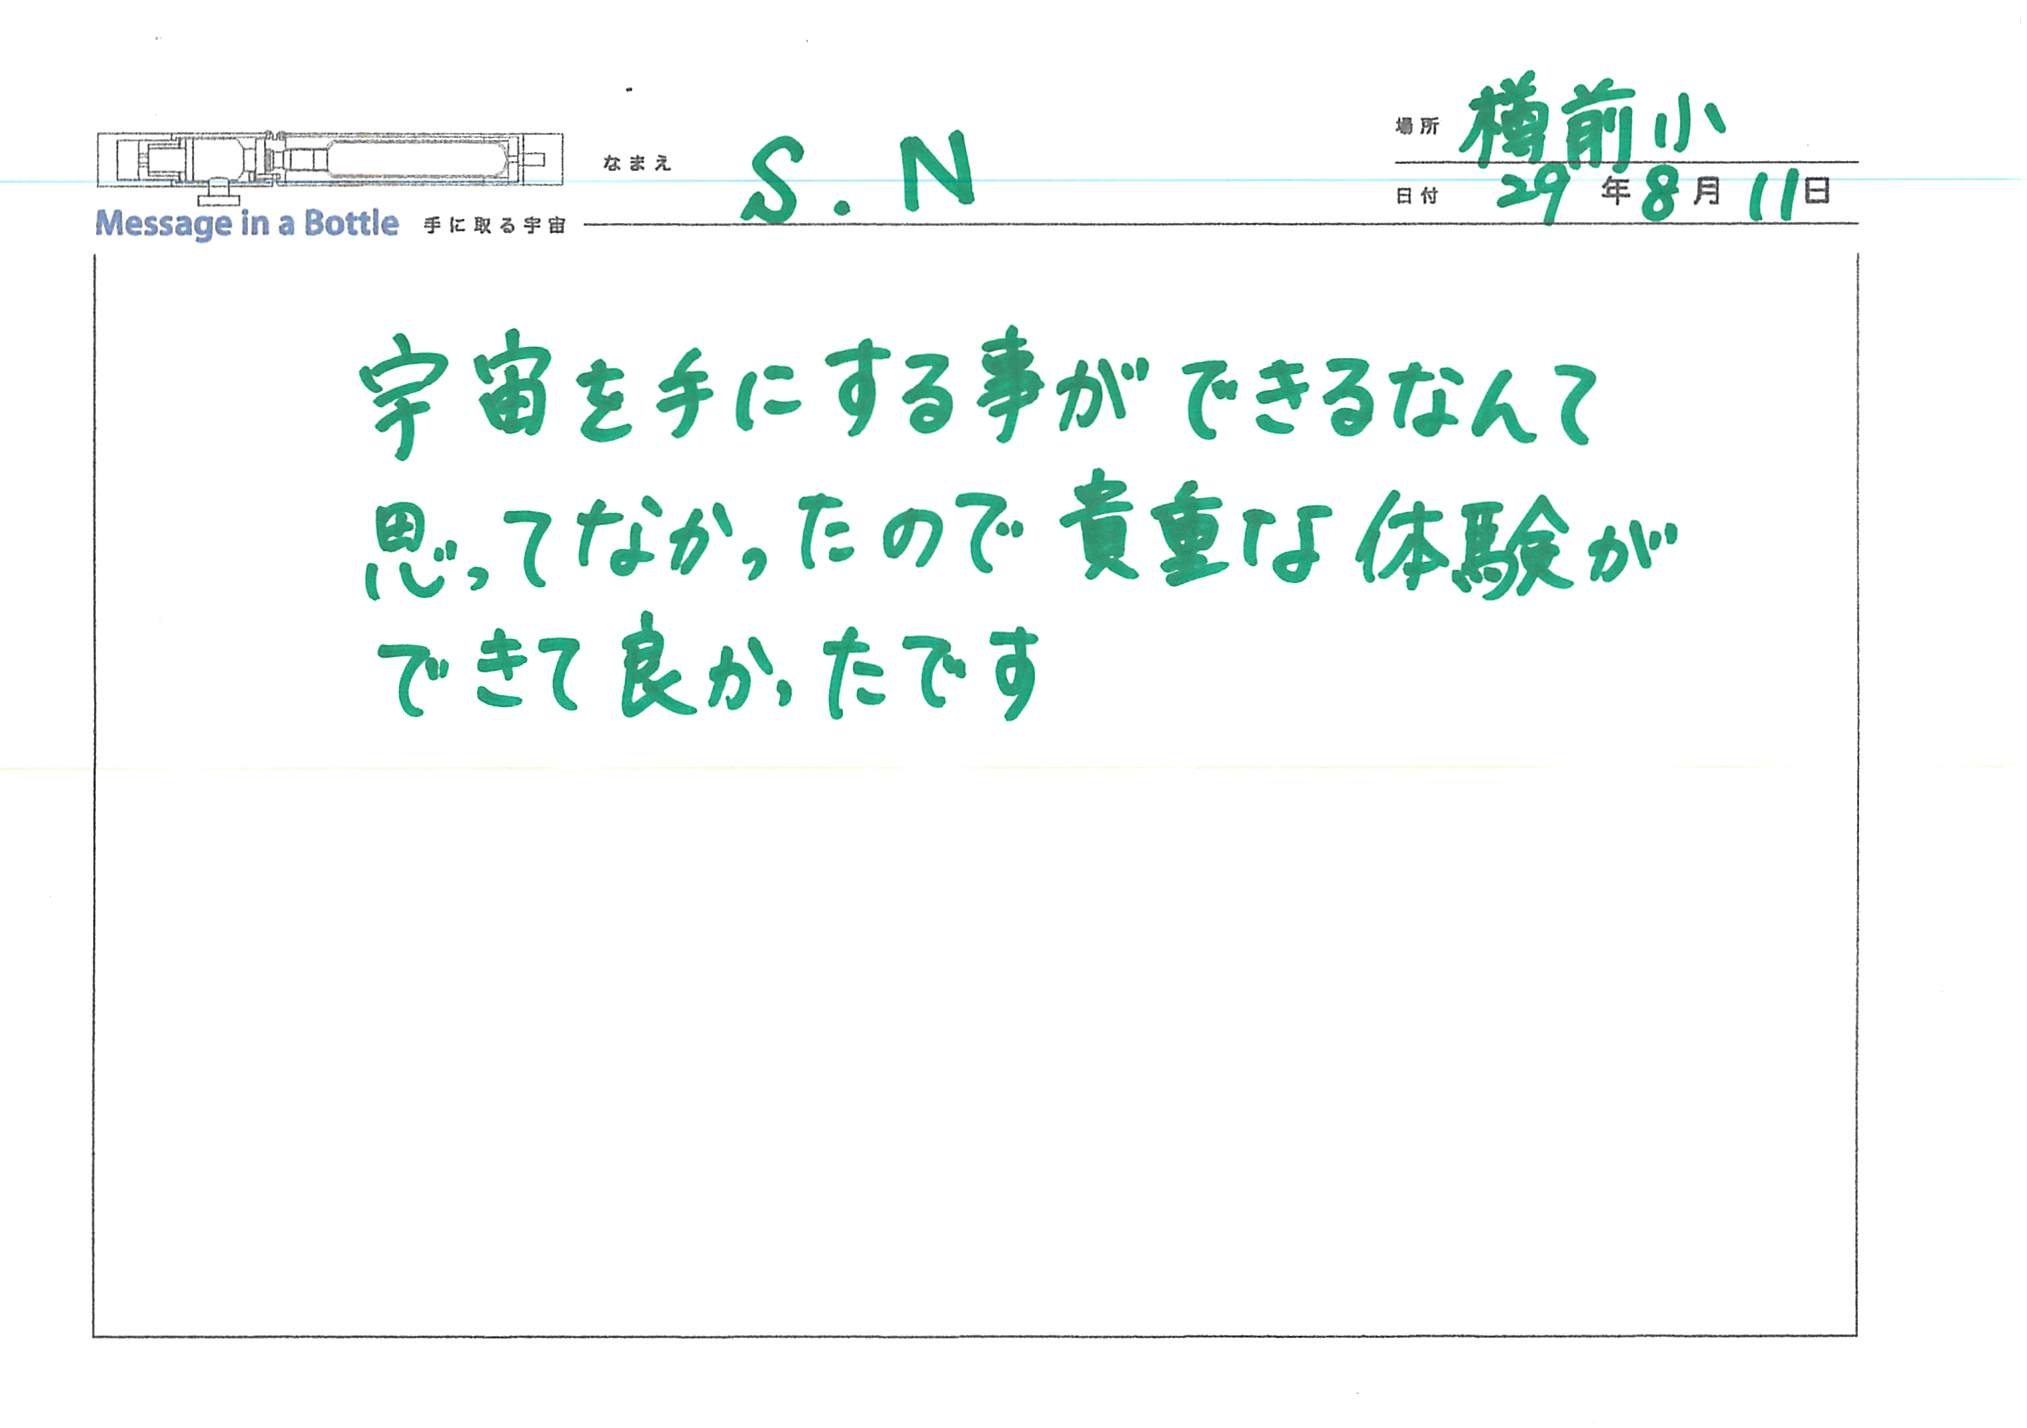 2017-08-11-19-01-00